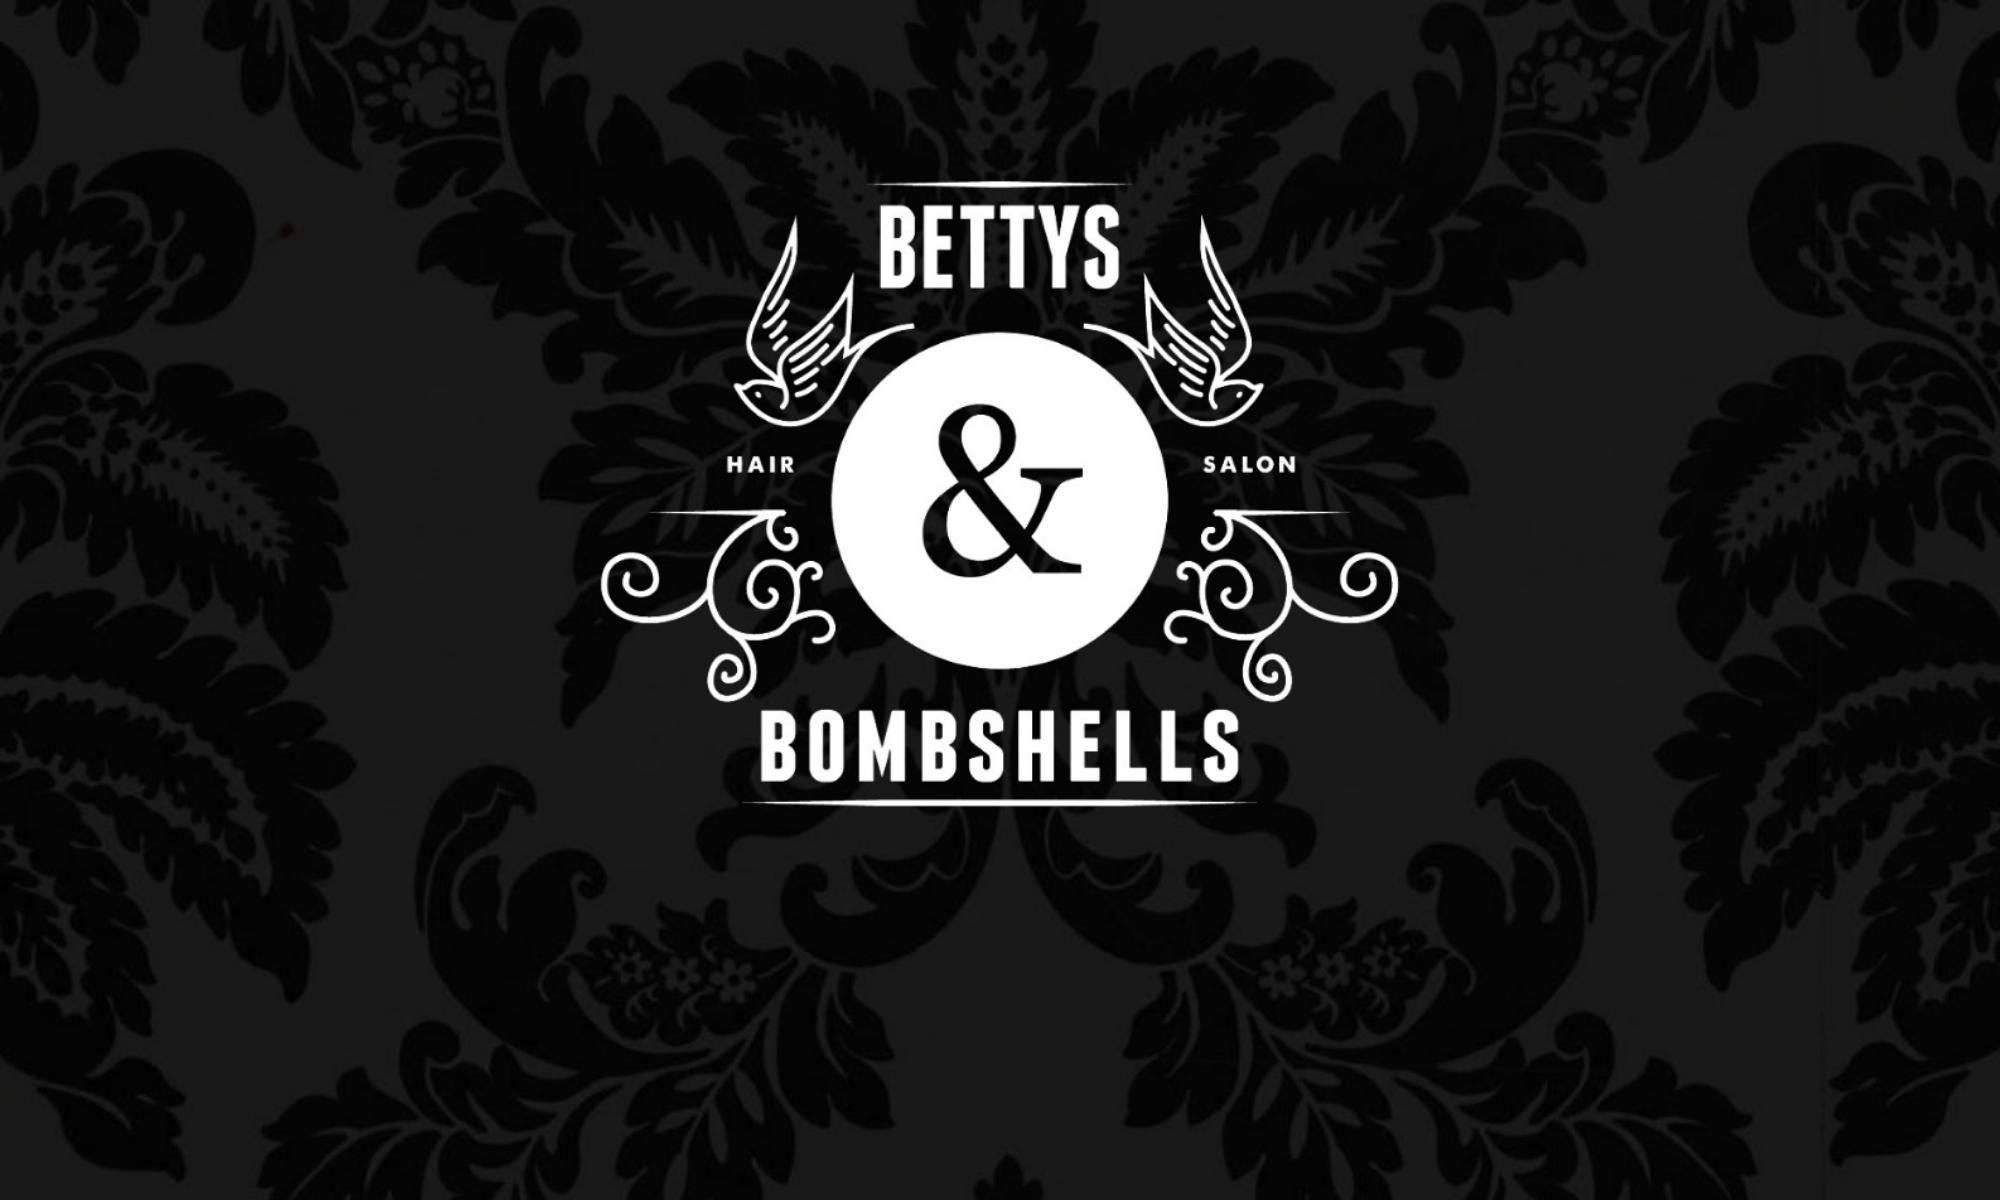 Bettys and Bombshells | Lethbridge Hair Salon